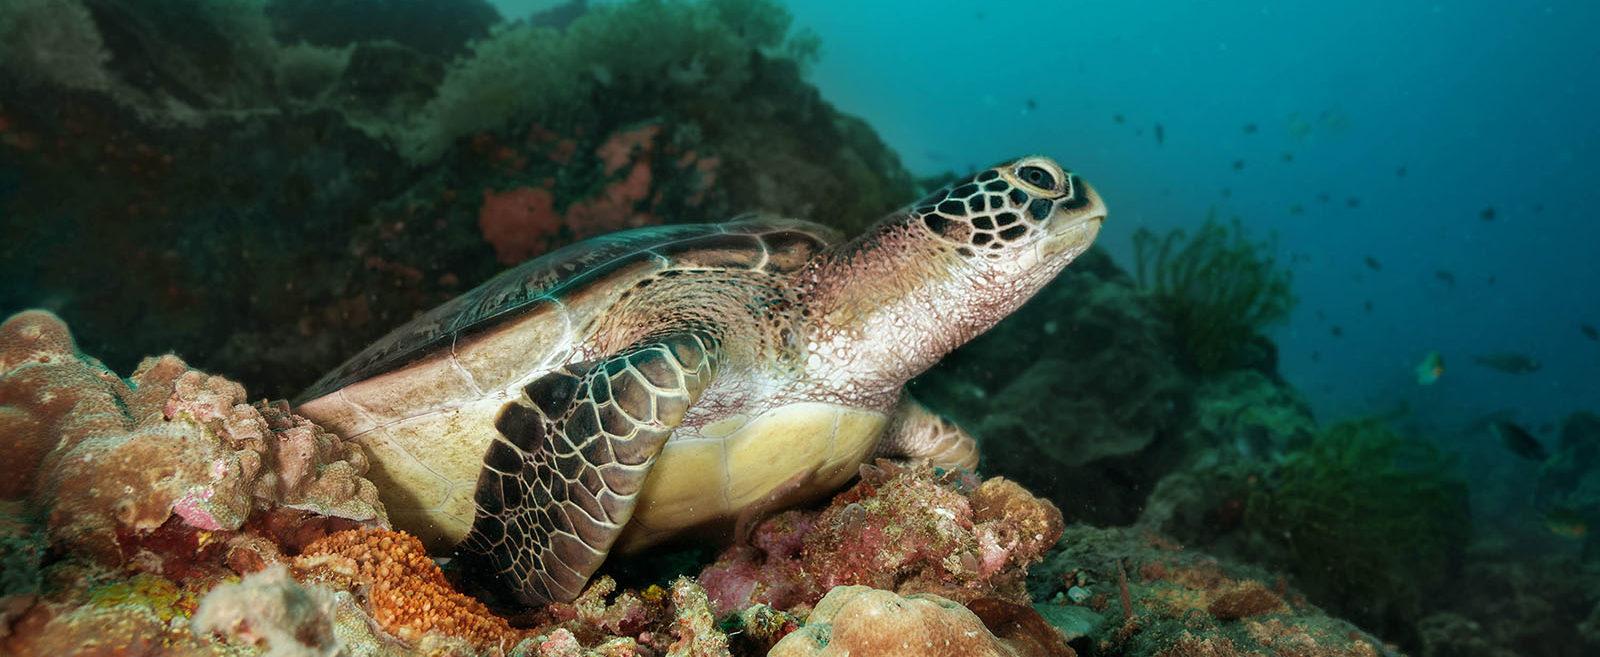 Philippines, Moalboal, Turtle